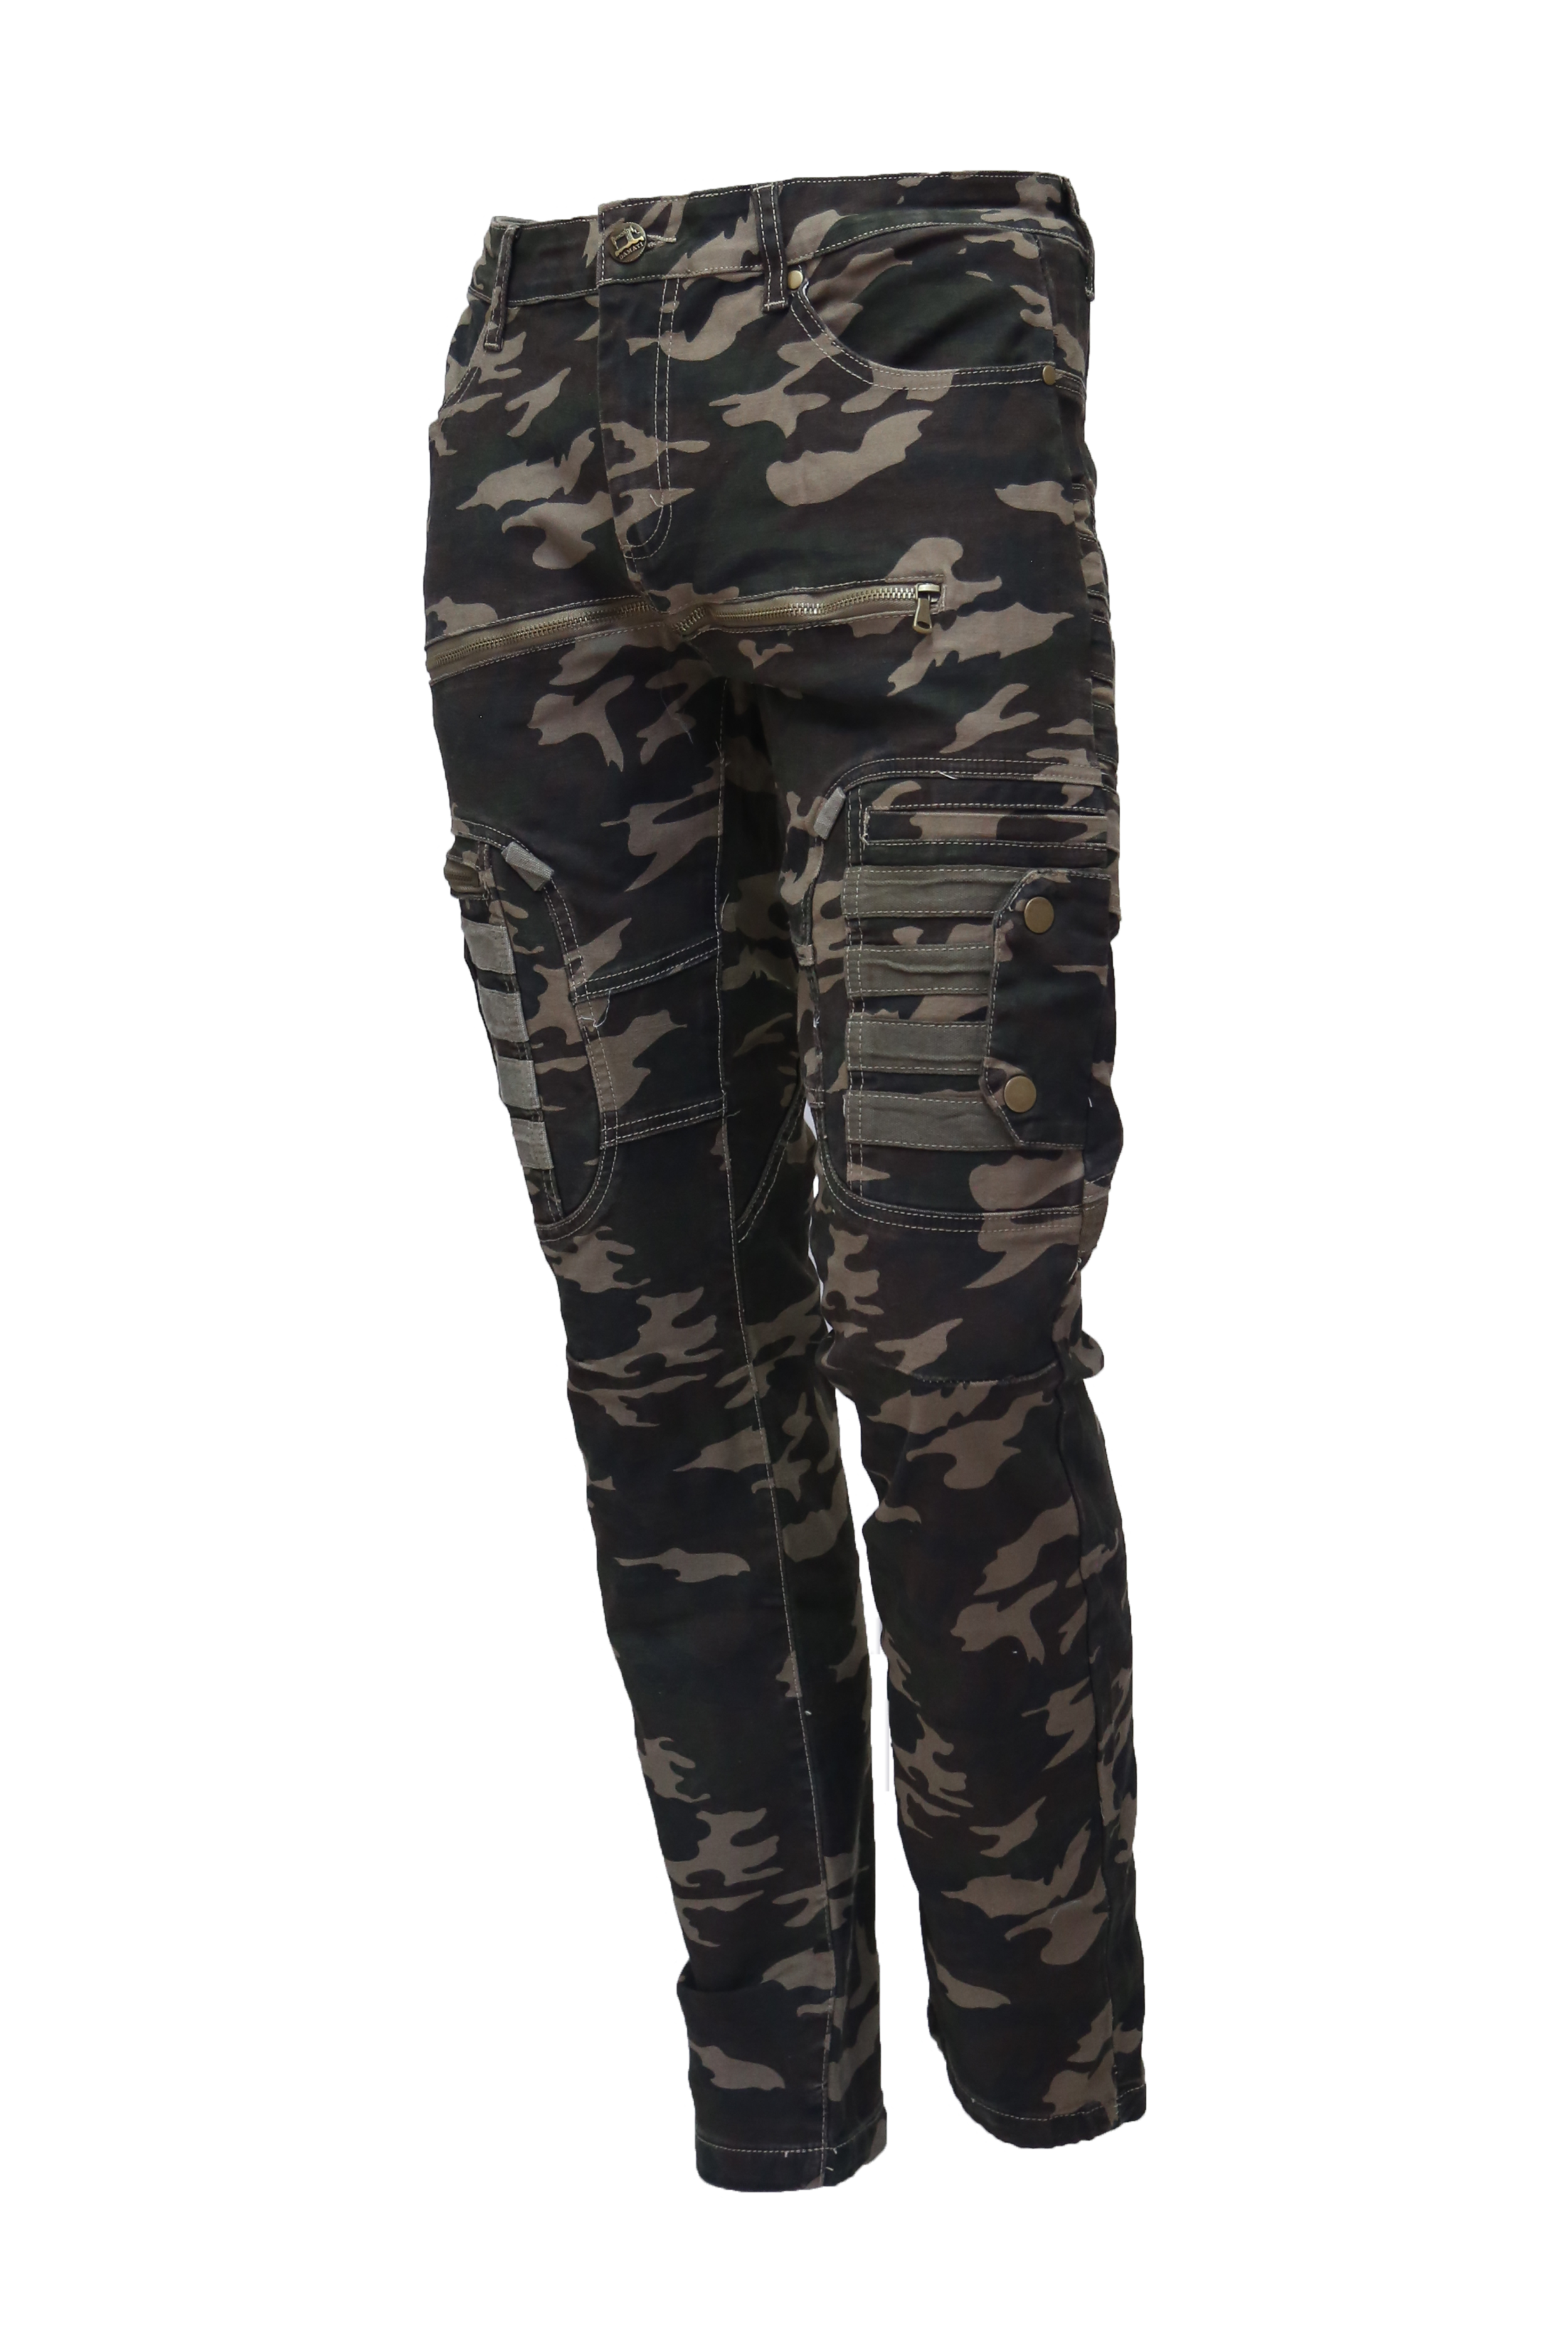 9 Pants.png